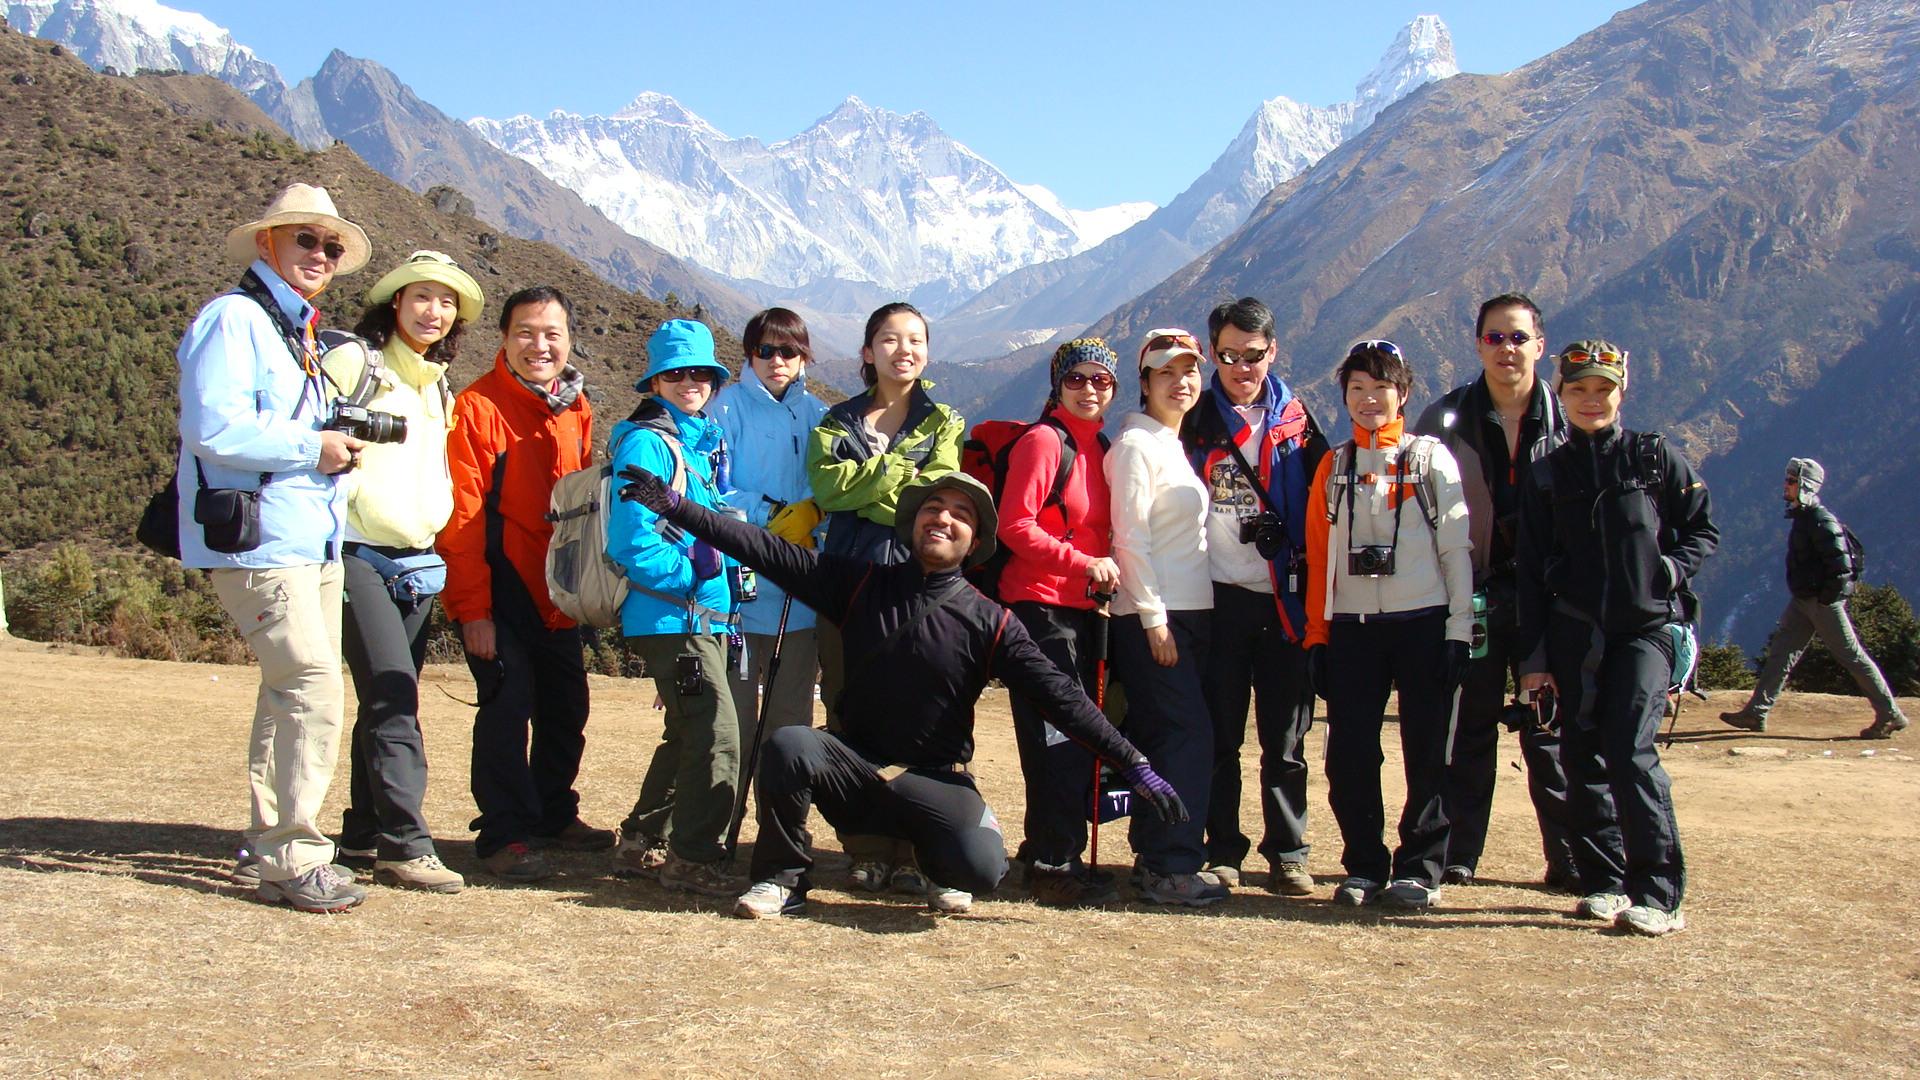 Inspiring Hiking and Trekking Quotes